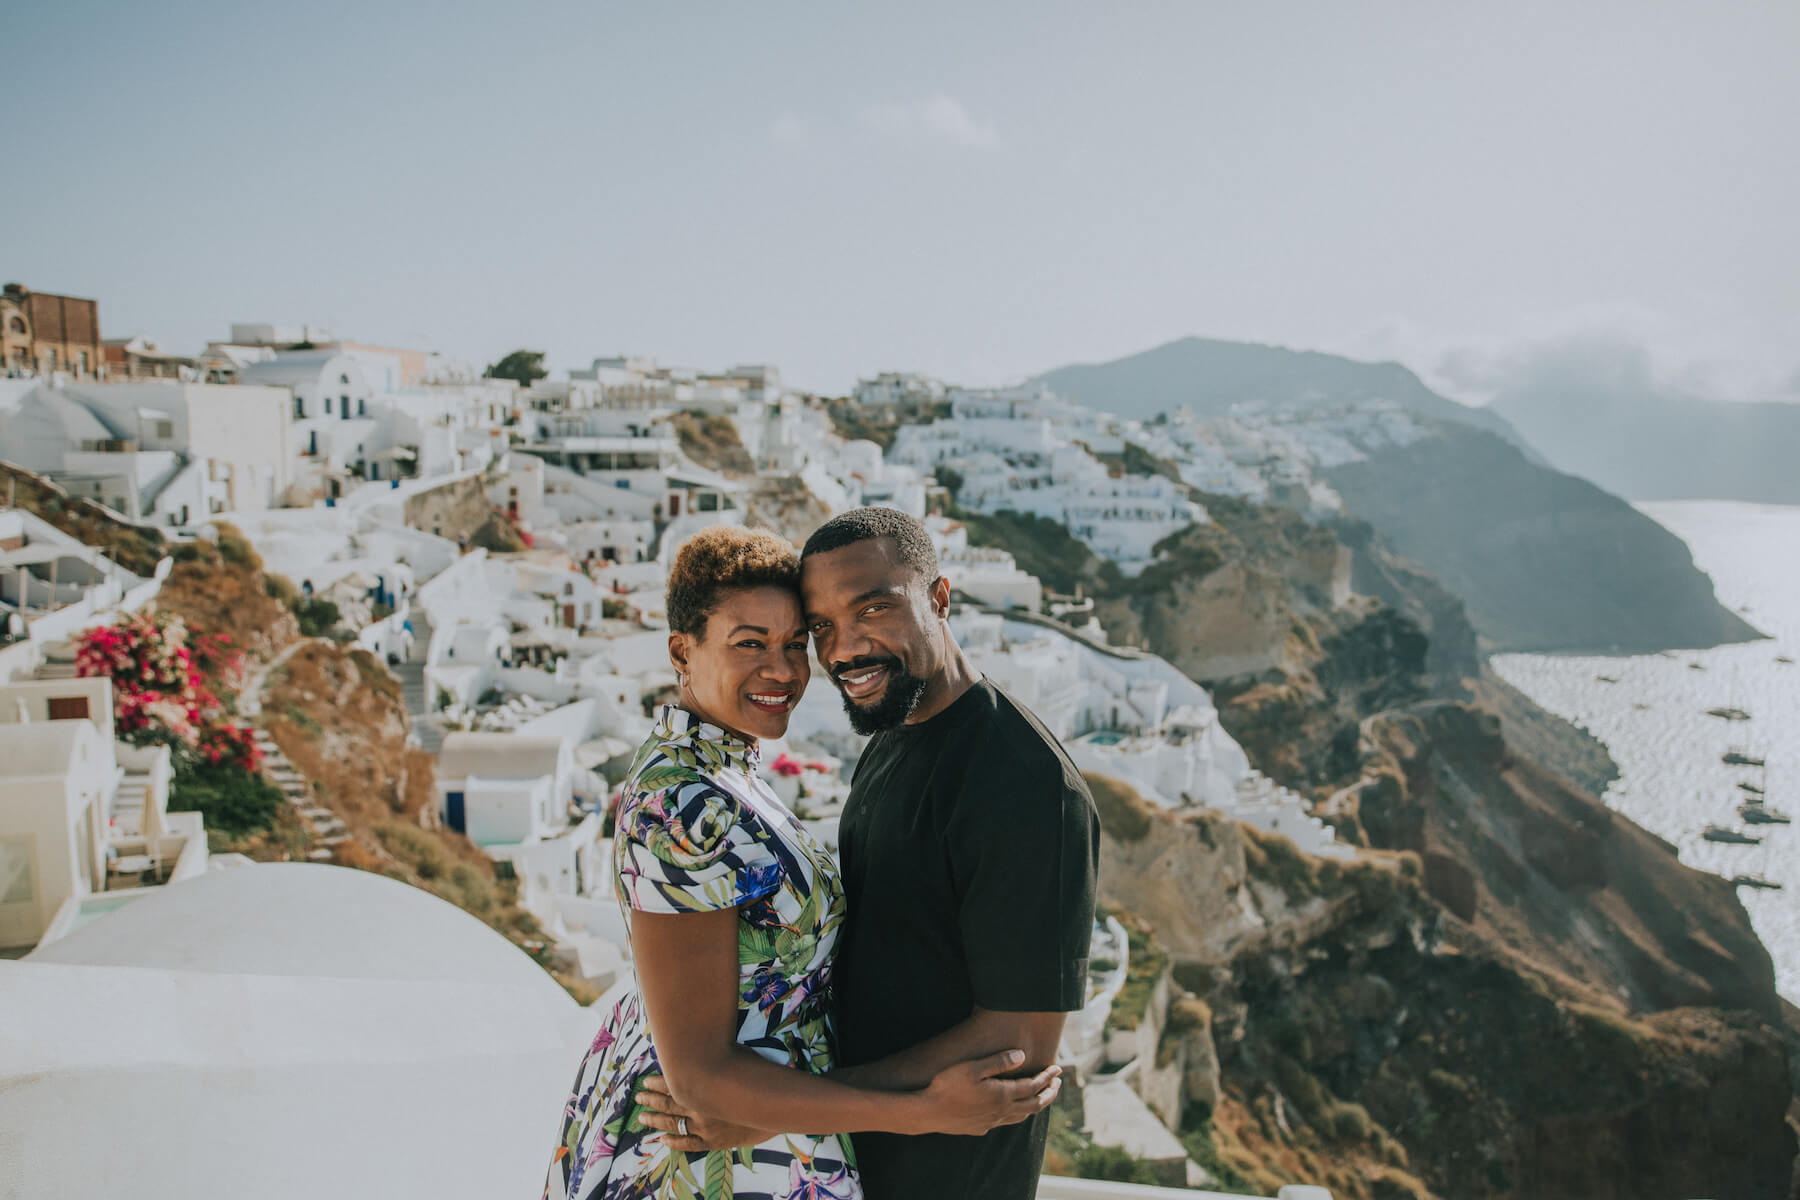 santorini-09-24-2019-couples-trip-2_original